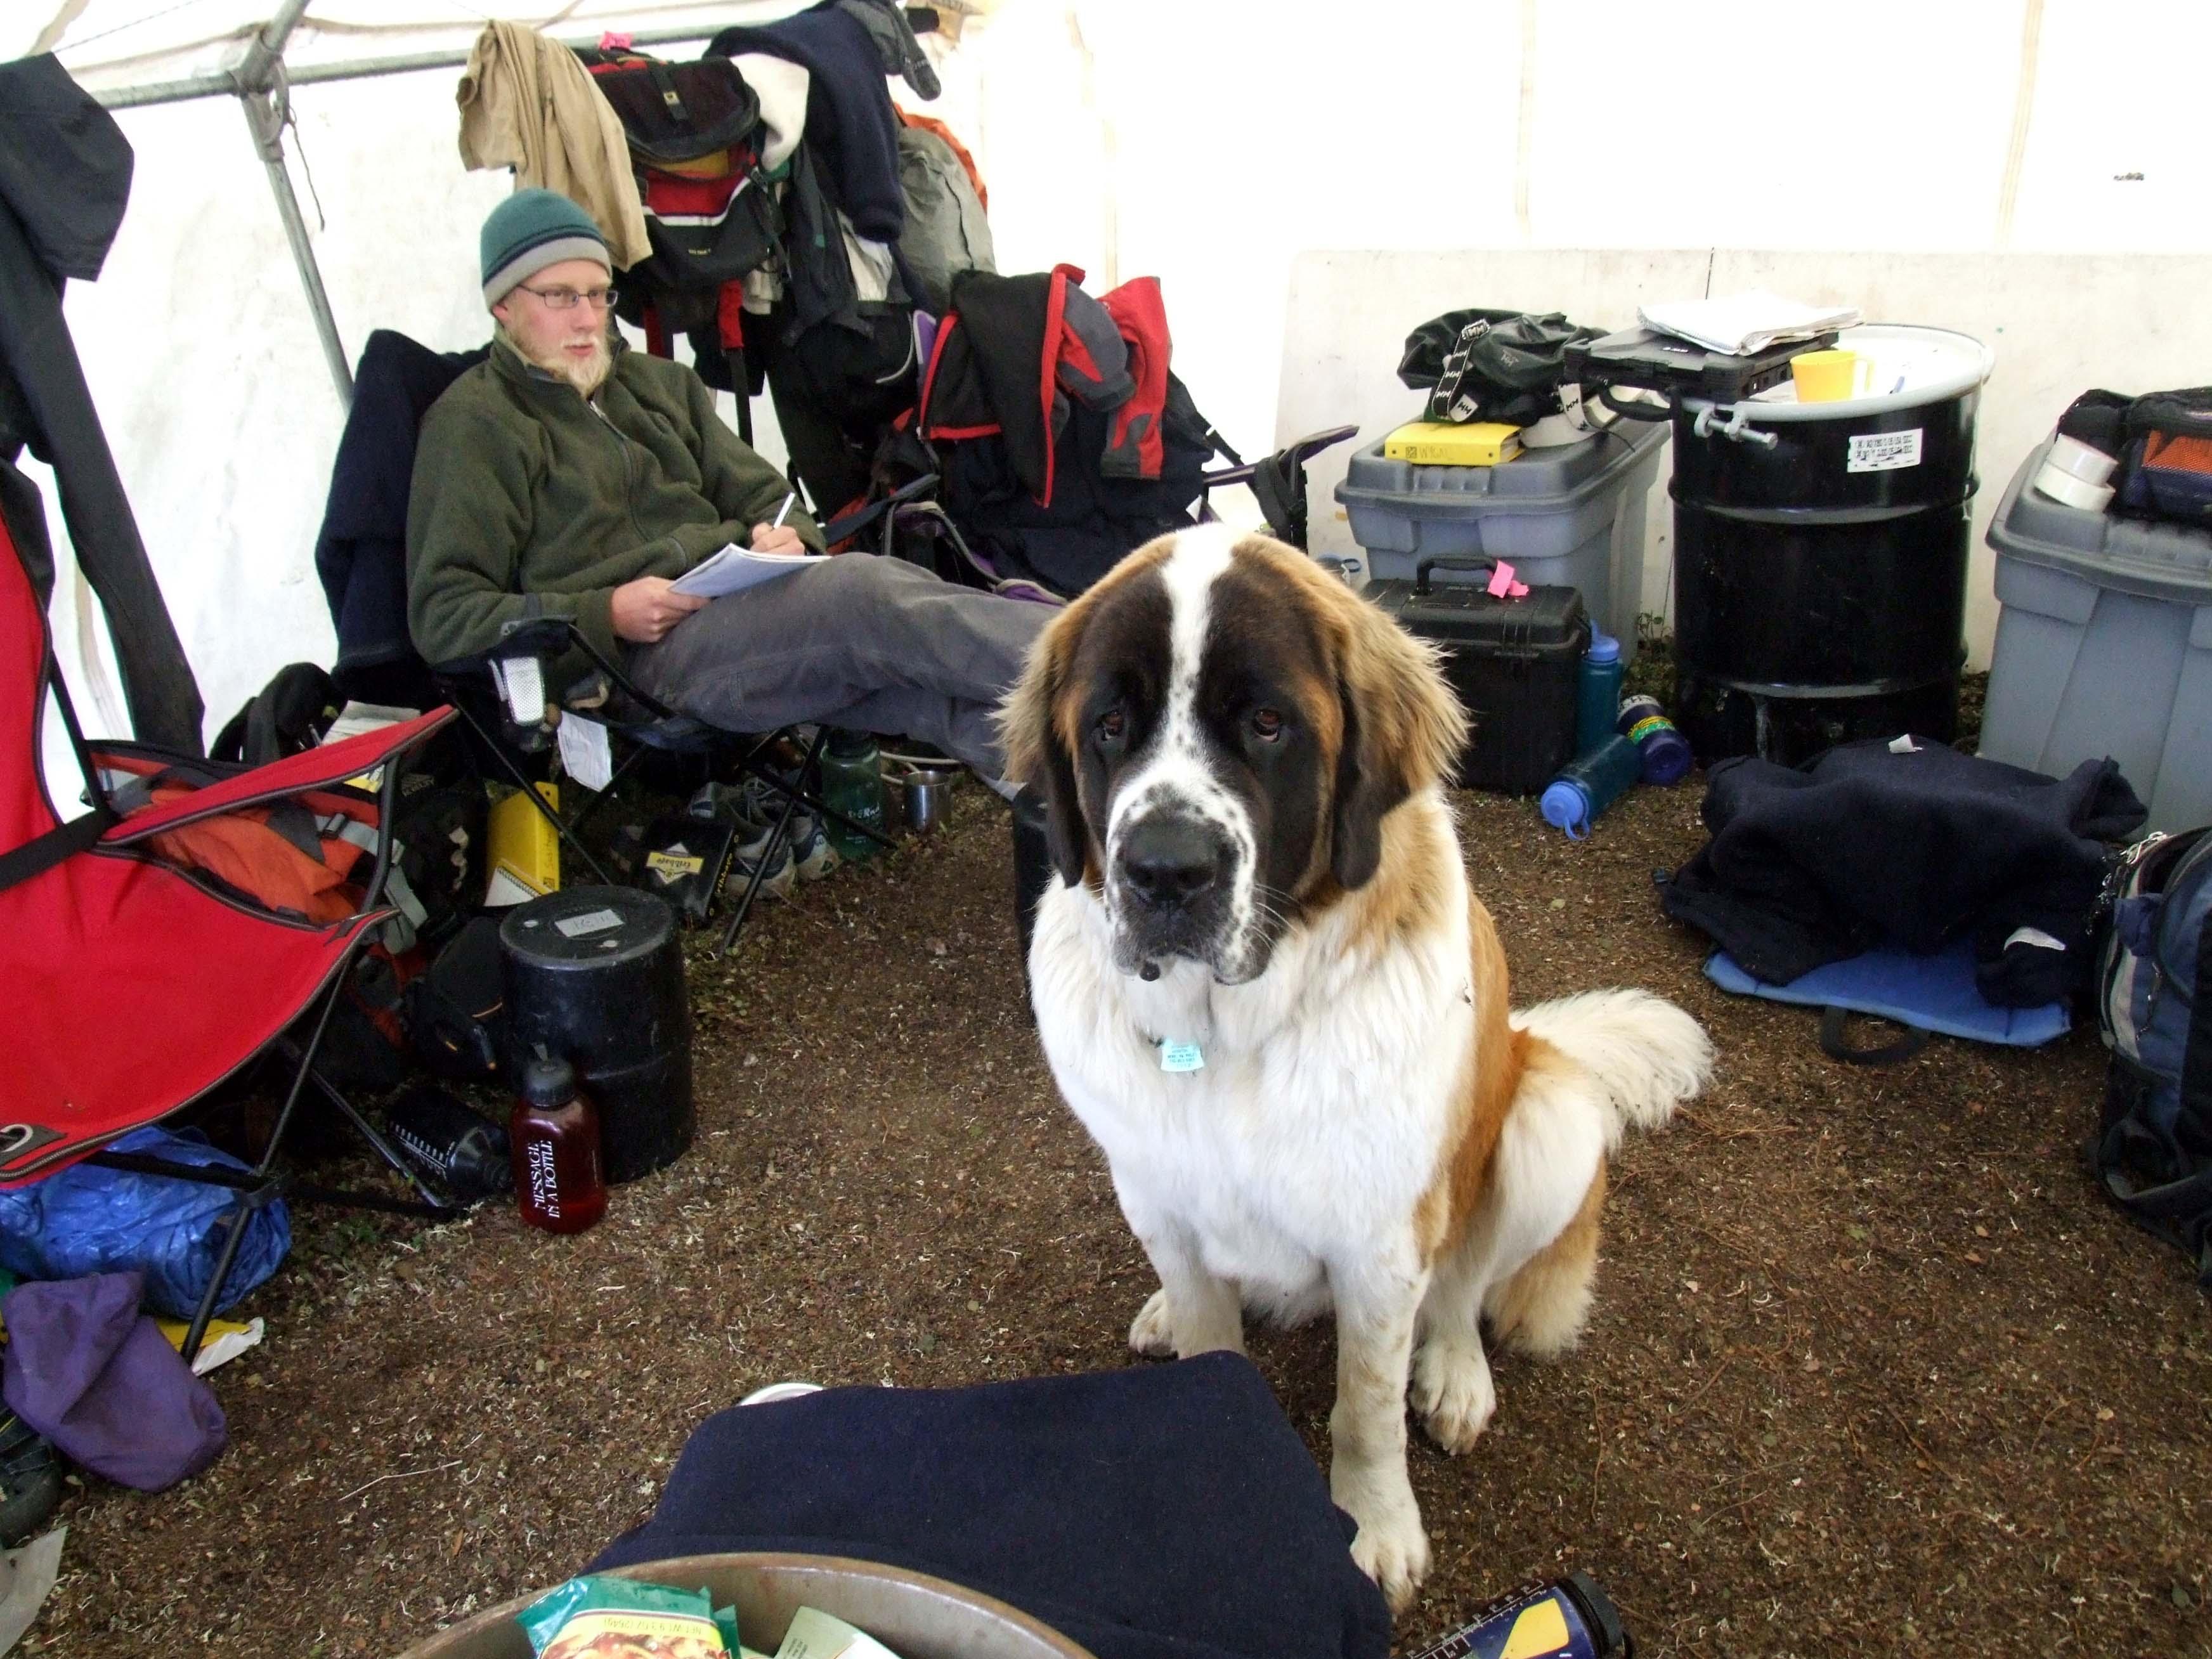 Large Dog Rope Tug Of War Toy